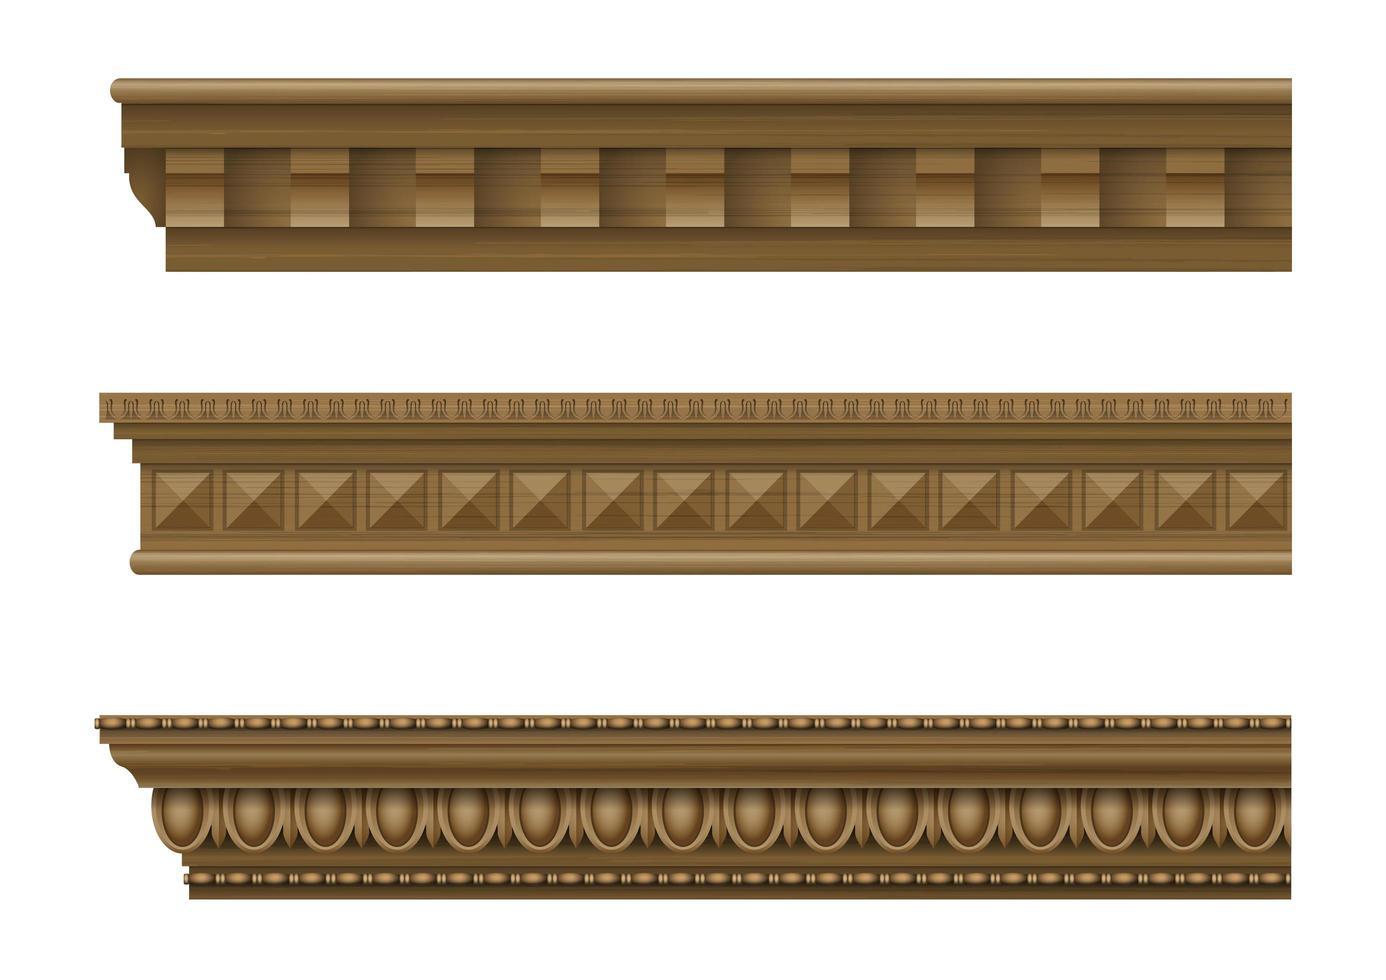 cornisas clásicas para las paredes de edificios vector